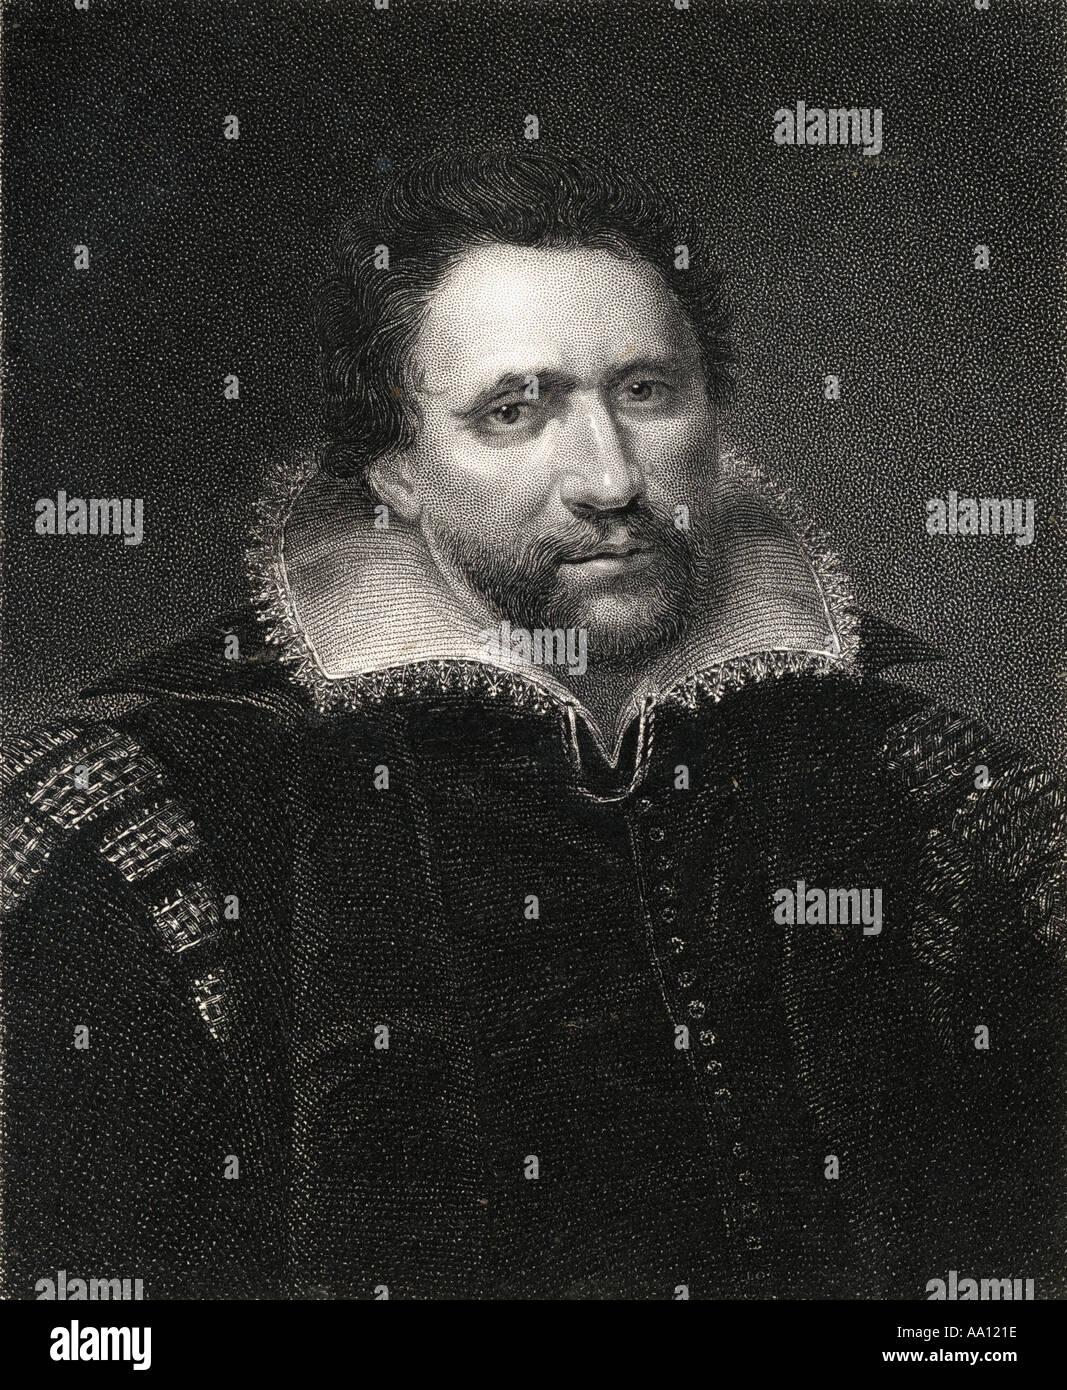 Ben Jonson, aka Benjamin Johnson, 1572 - 1637.  English Renaissance dramatist,  poet and actor. - Stock Image